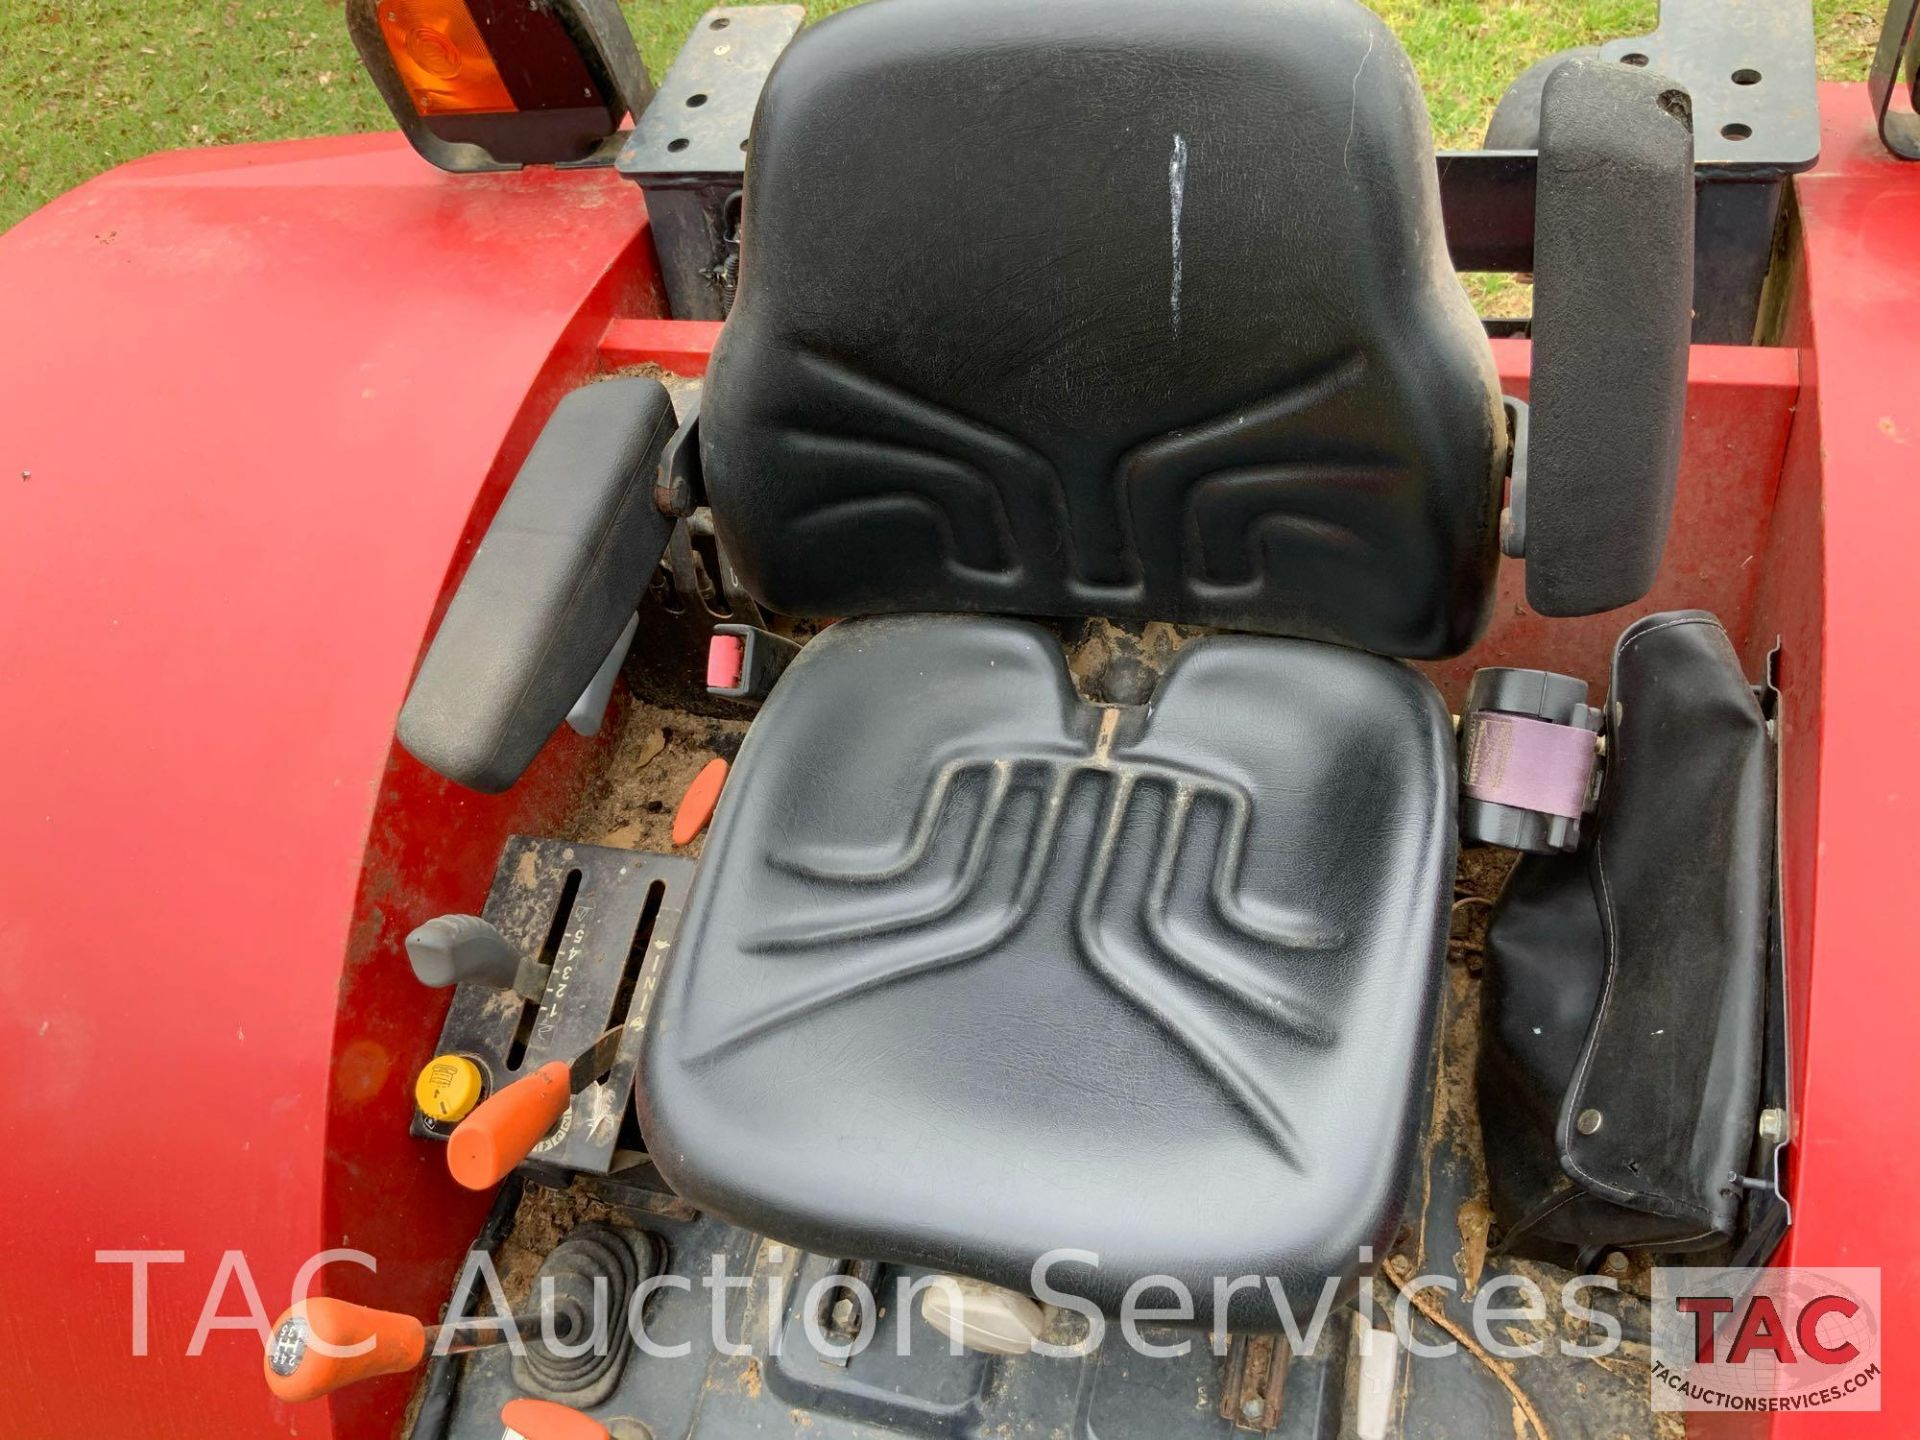 Massey-Ferguson 4610LP Farm Tractor - Image 16 of 26